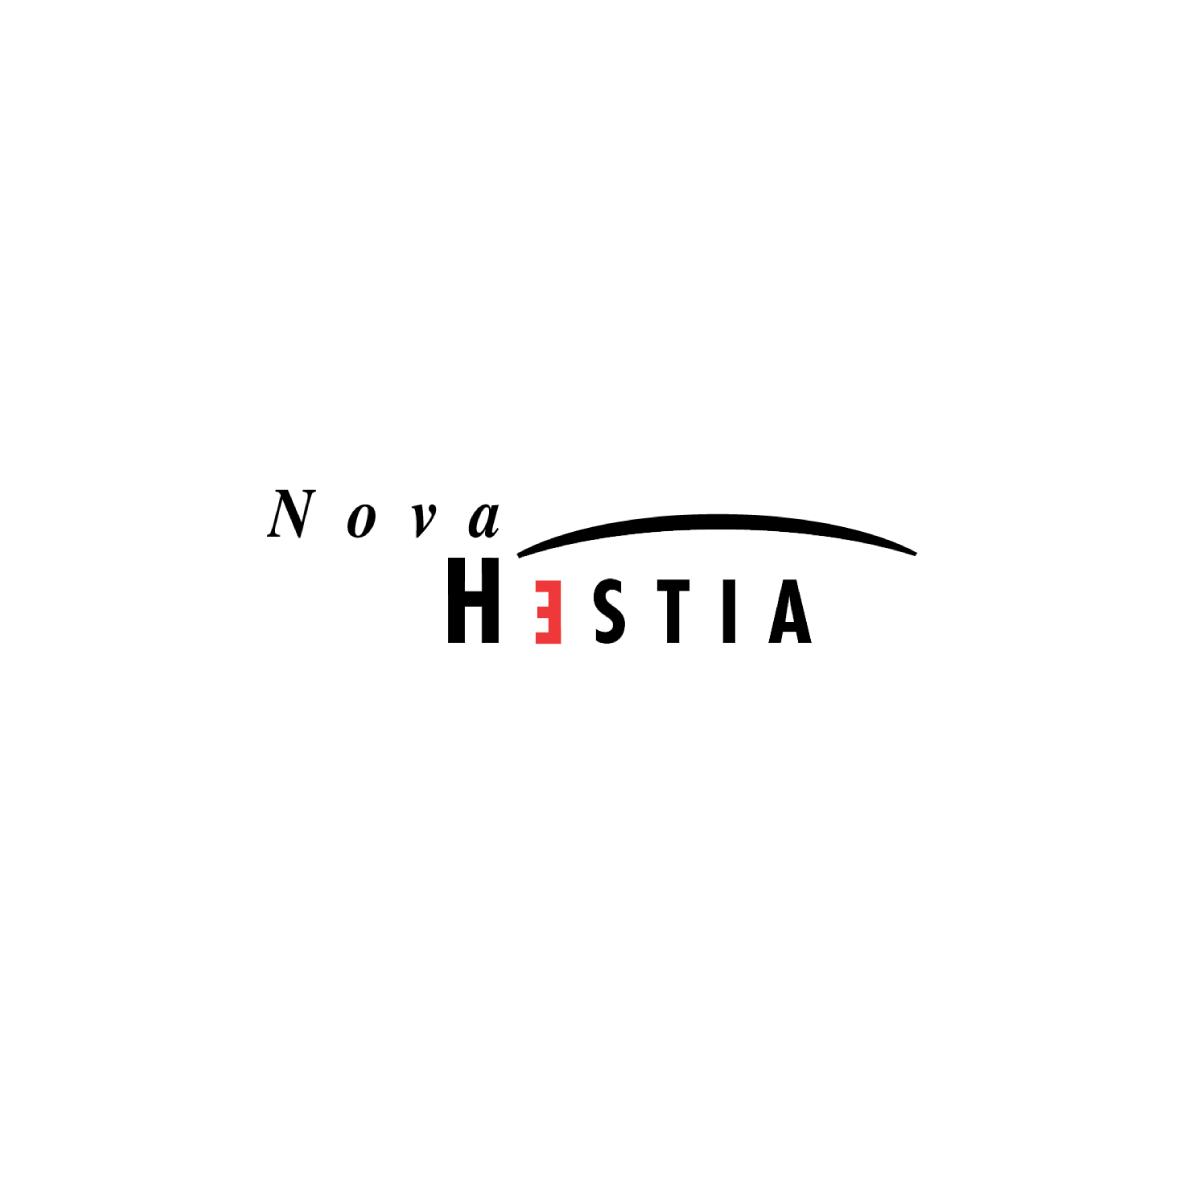 NovaHestia